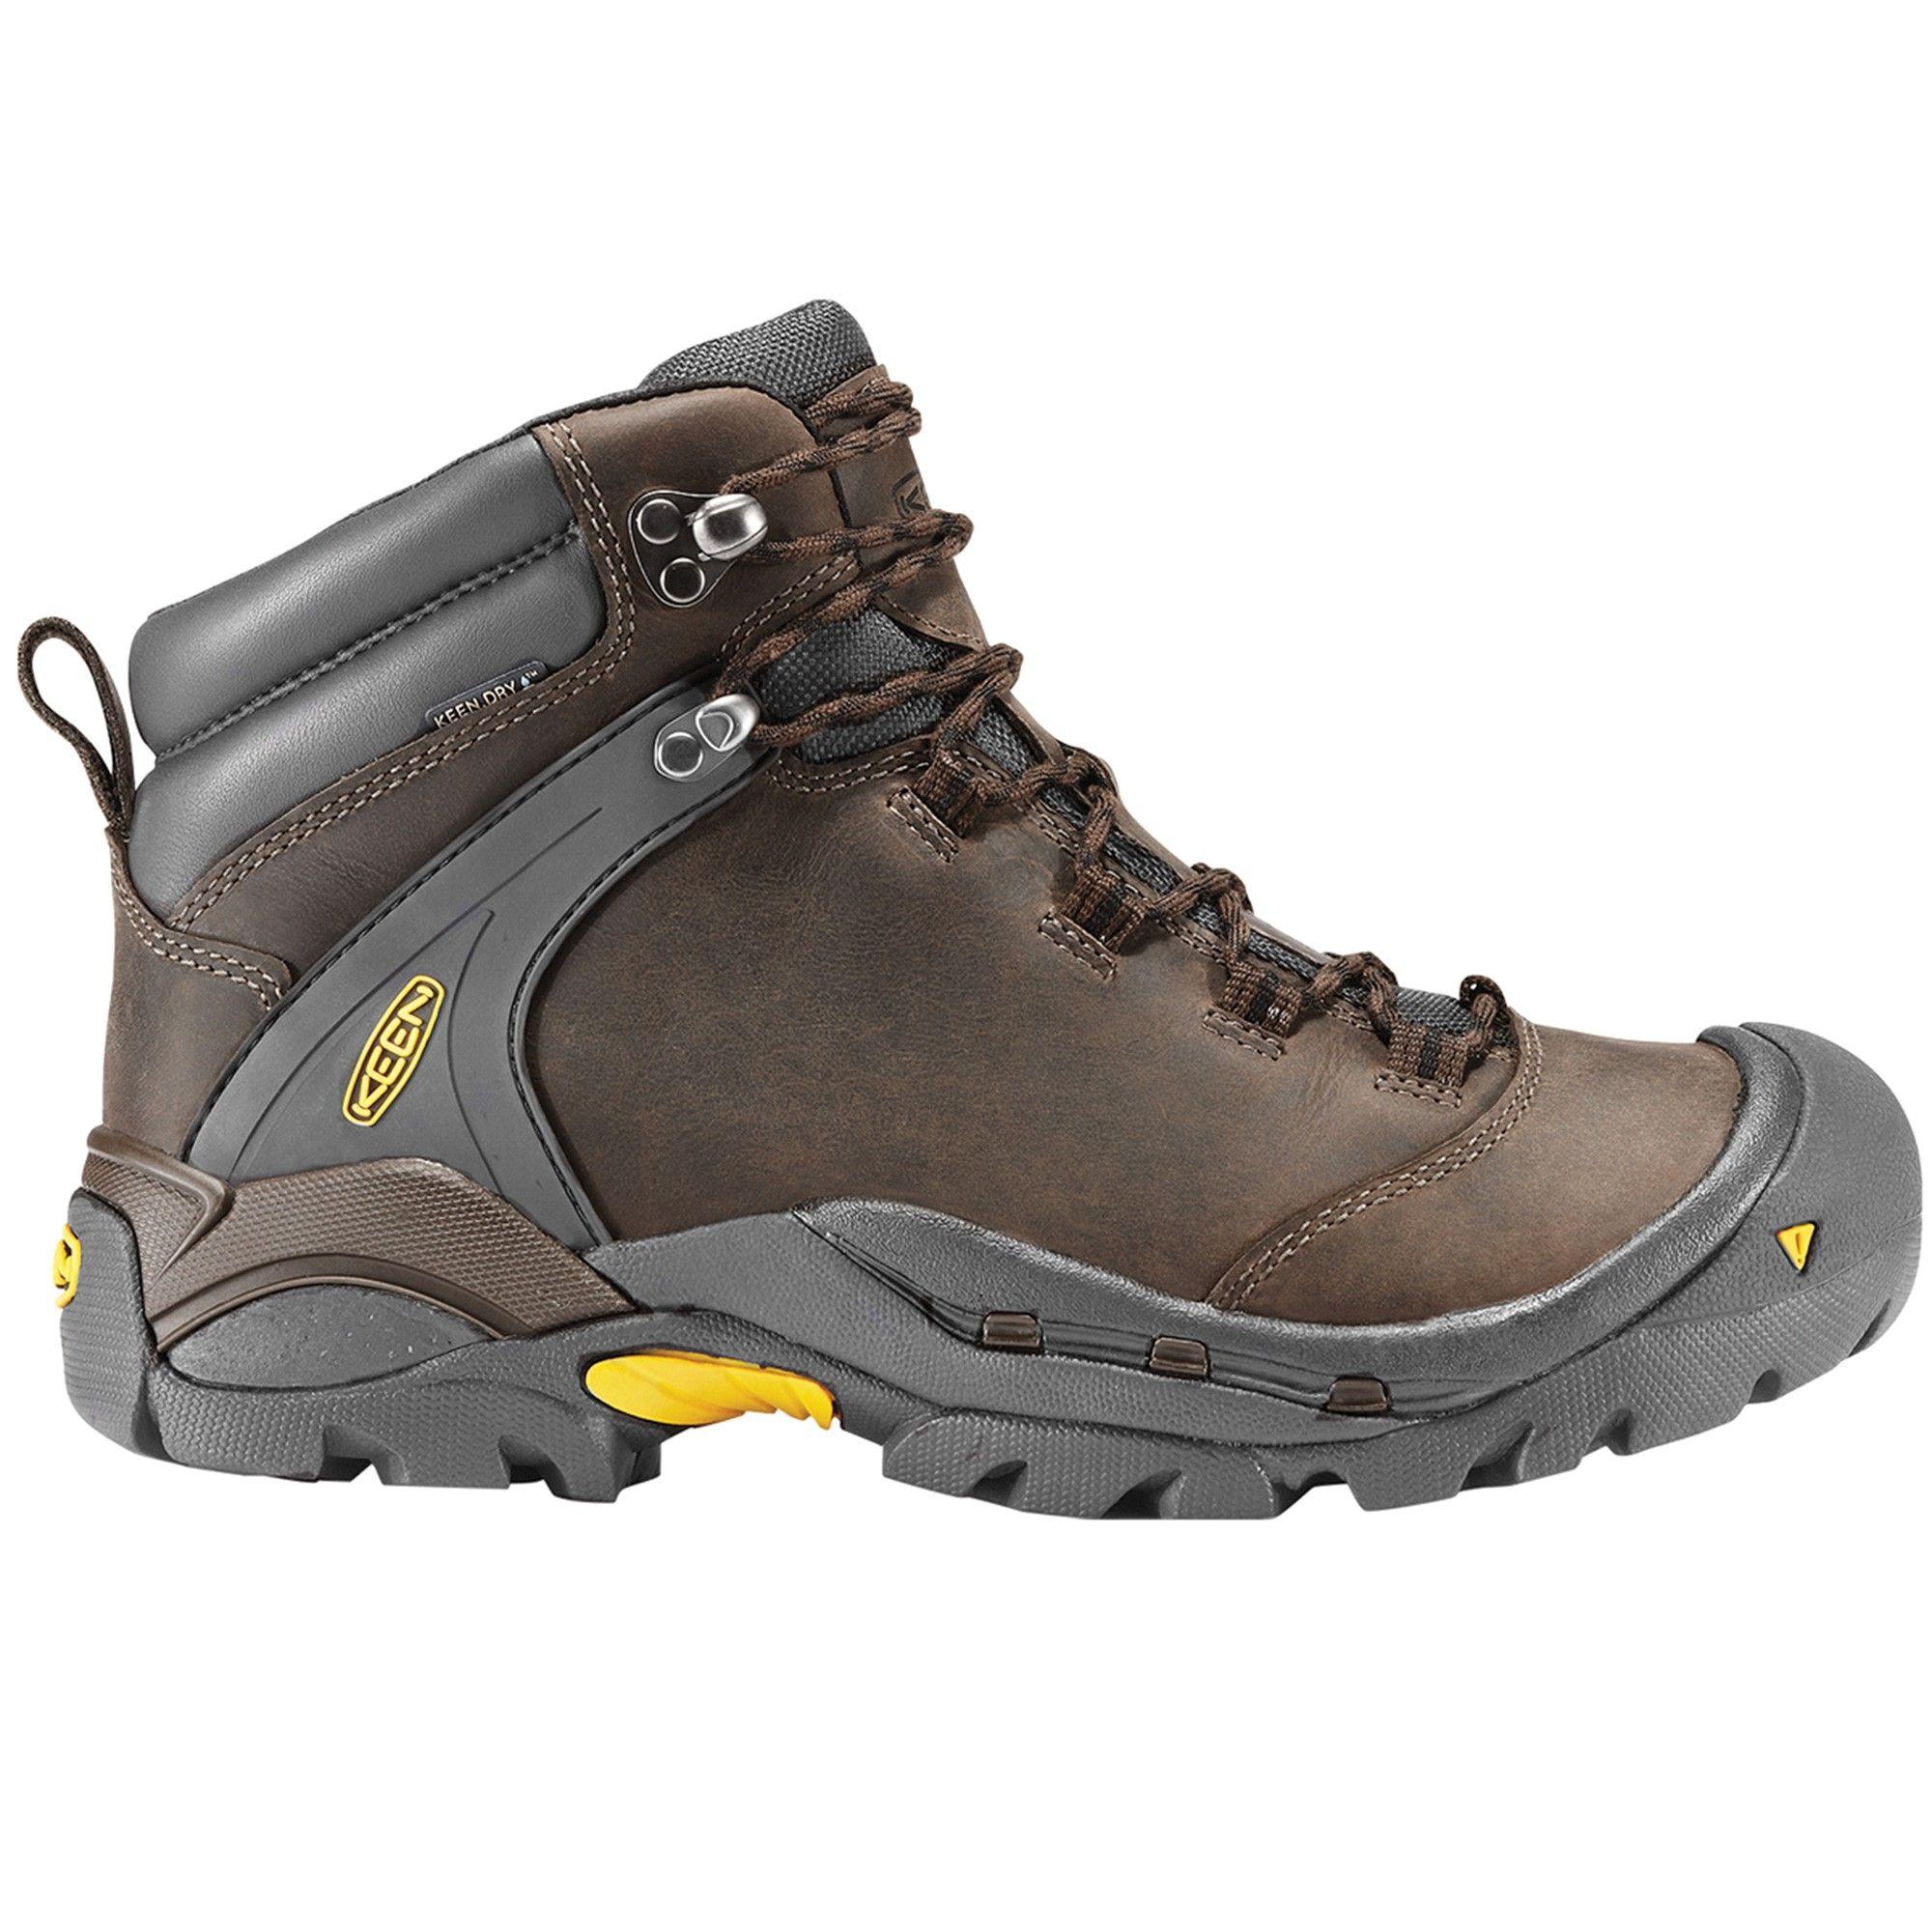 Buy Keen Ketchum Men's Leather Hiking Boots - Slate Black/Black Online at  Kathmandu $219.98